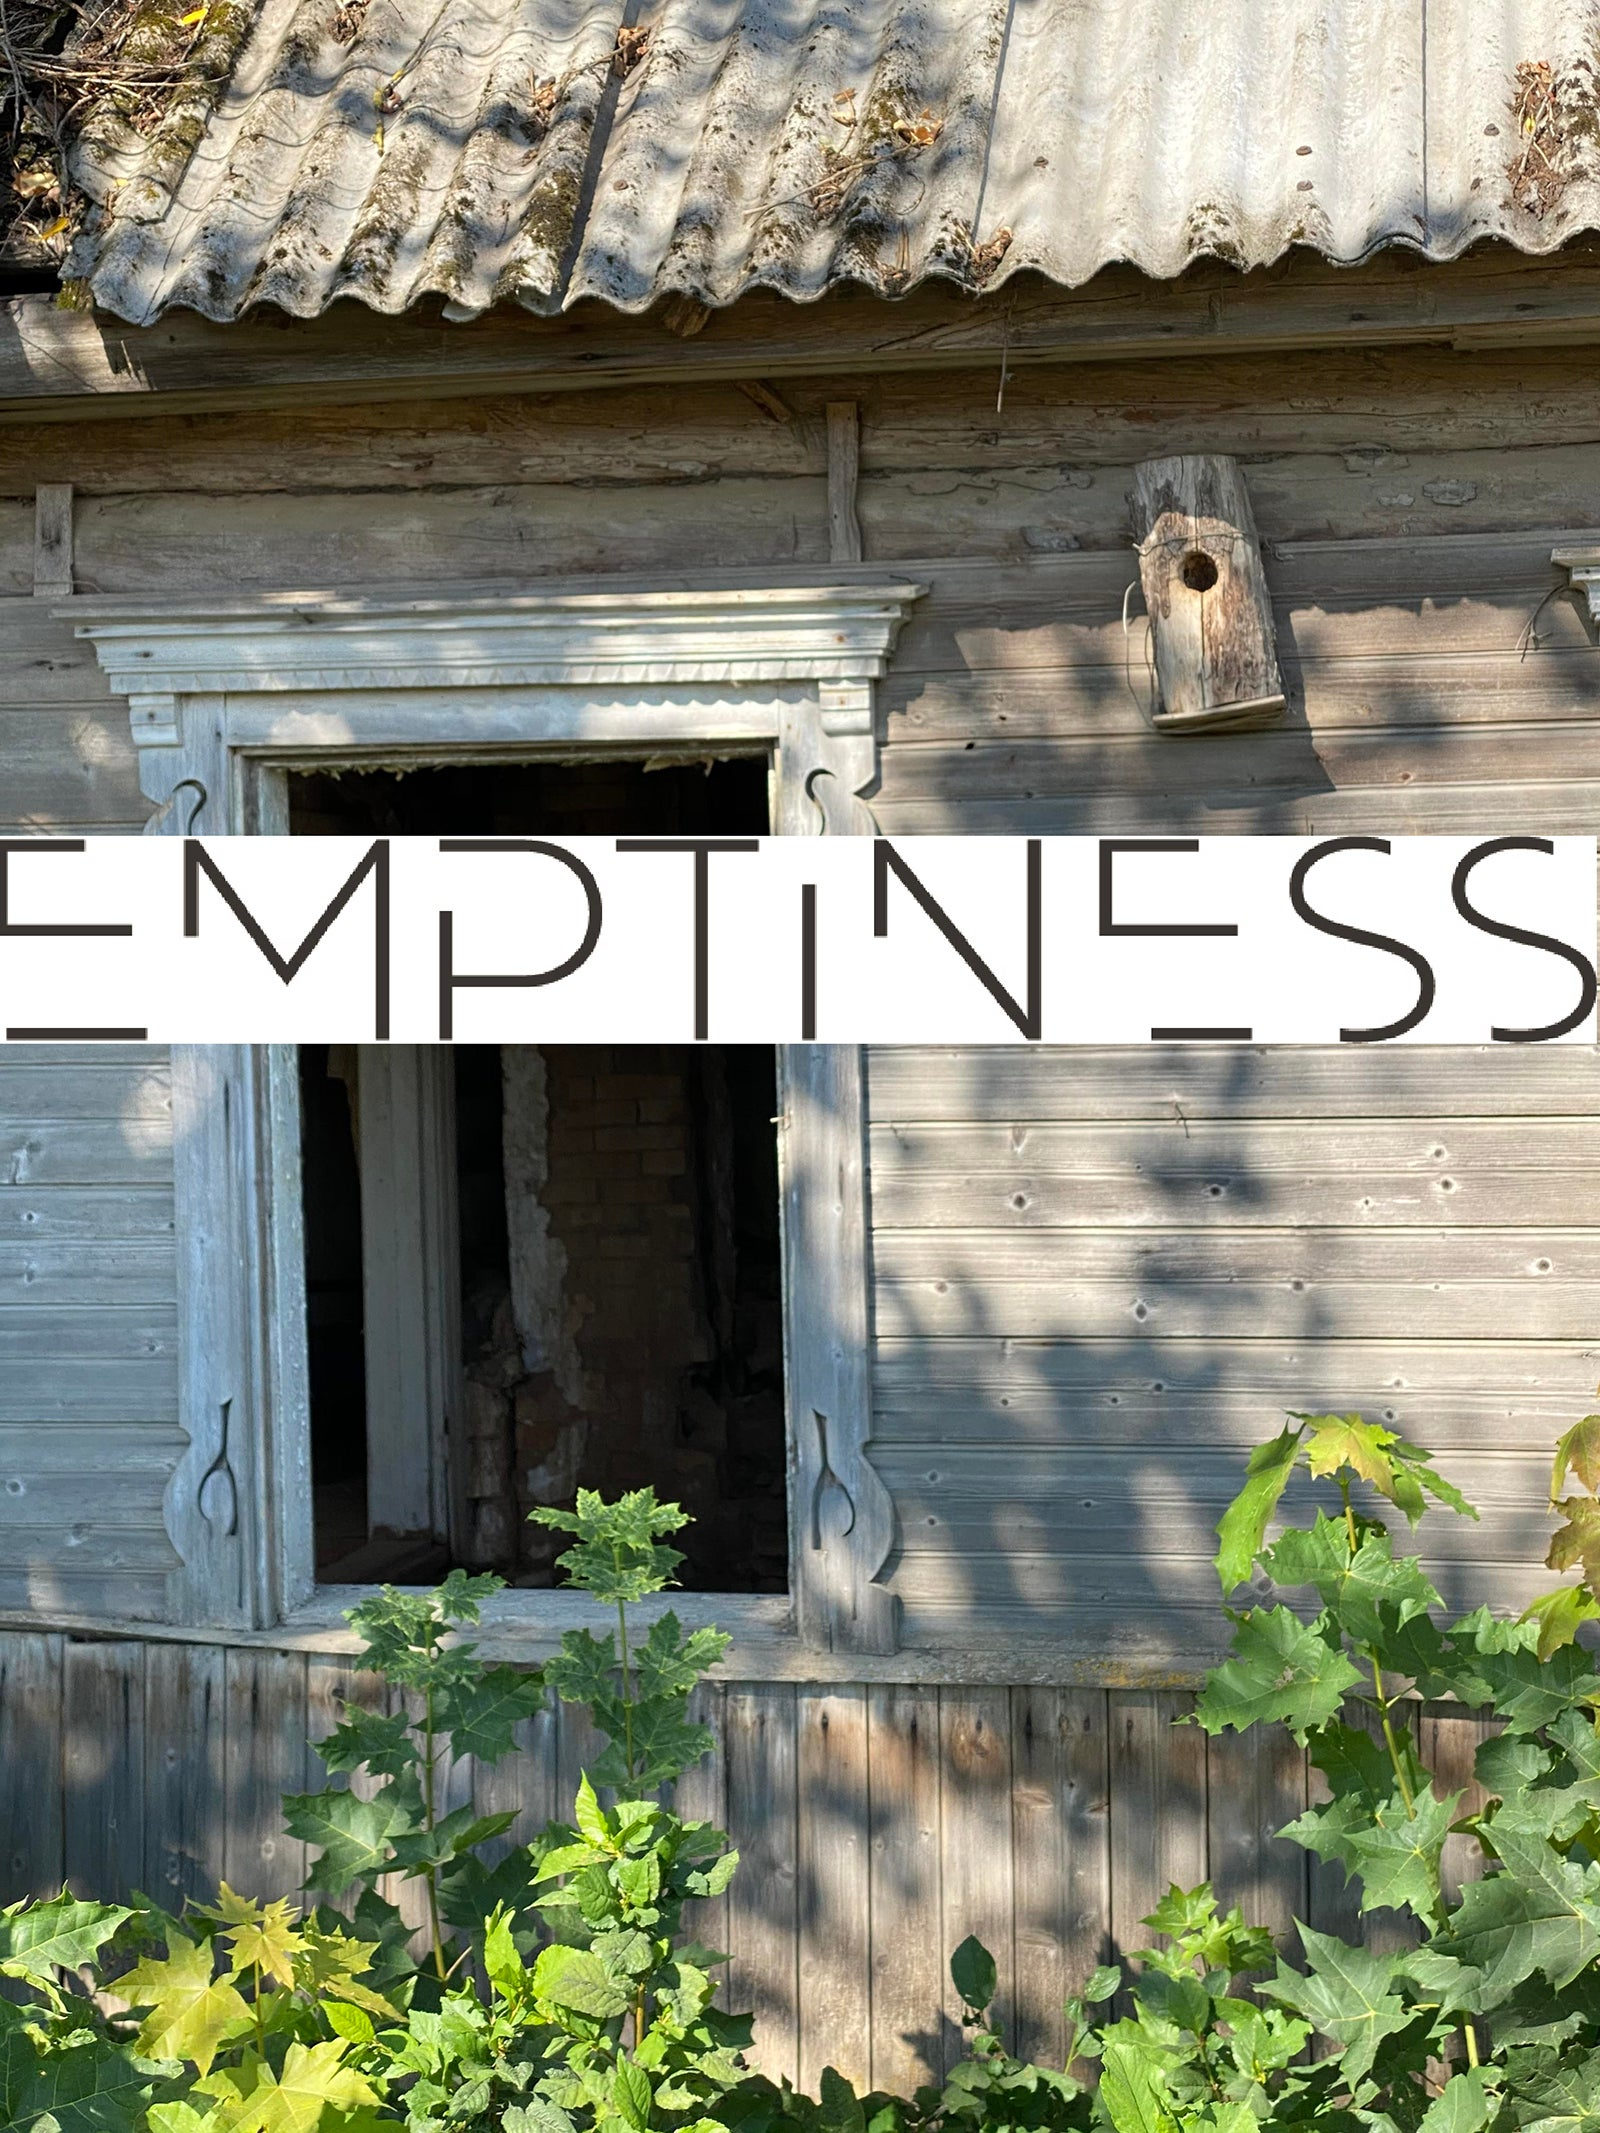 Window of an abandoned house in rural Latvia. Credit: Dace Dzenovska.